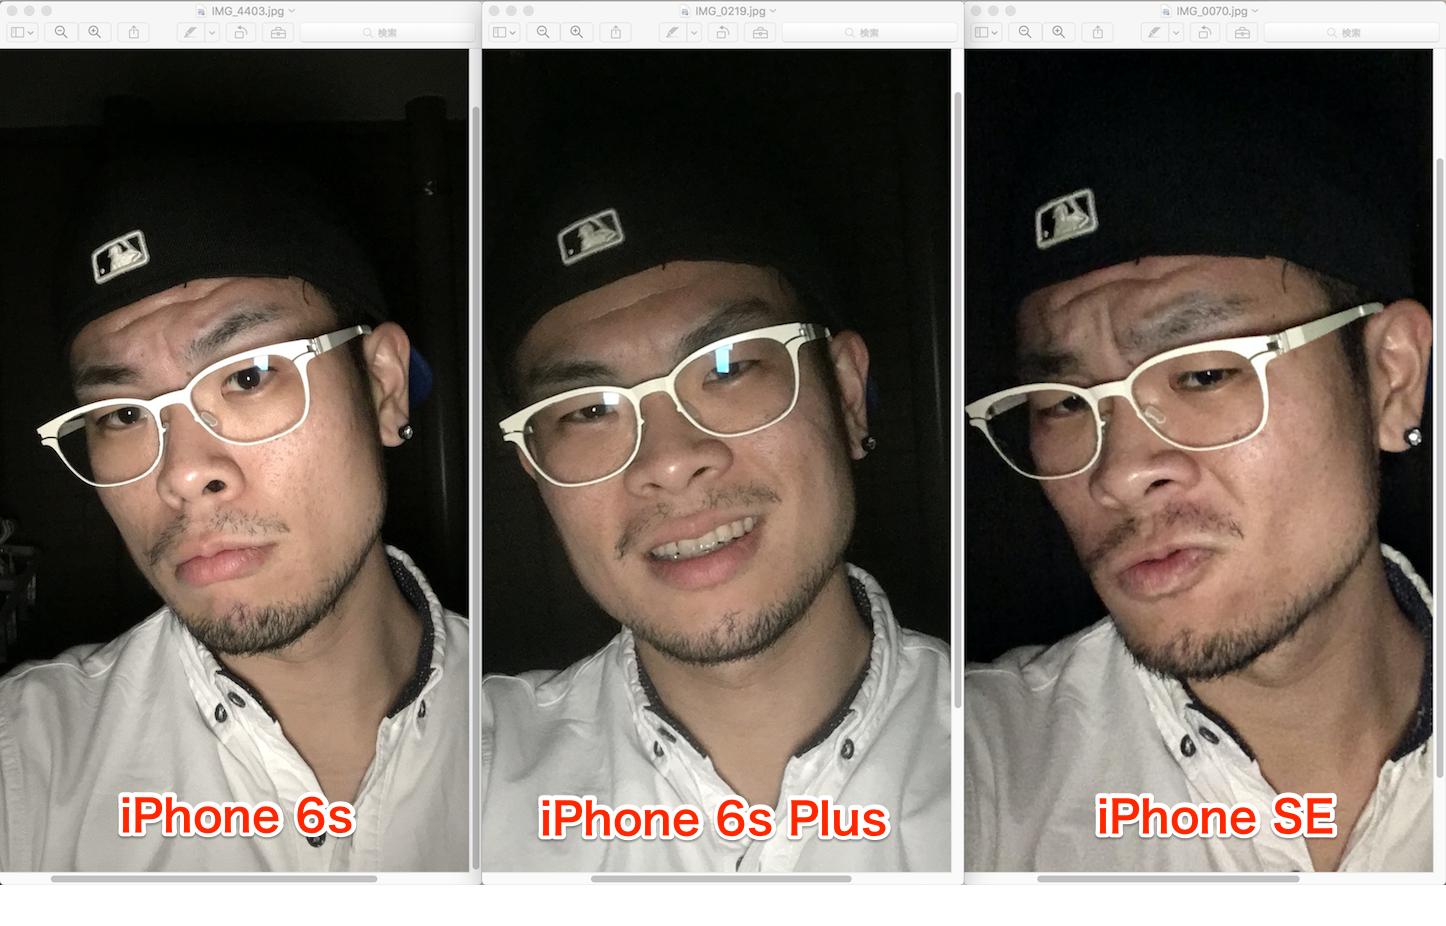 IPhone SE/6s/6splusでセルフィ比較